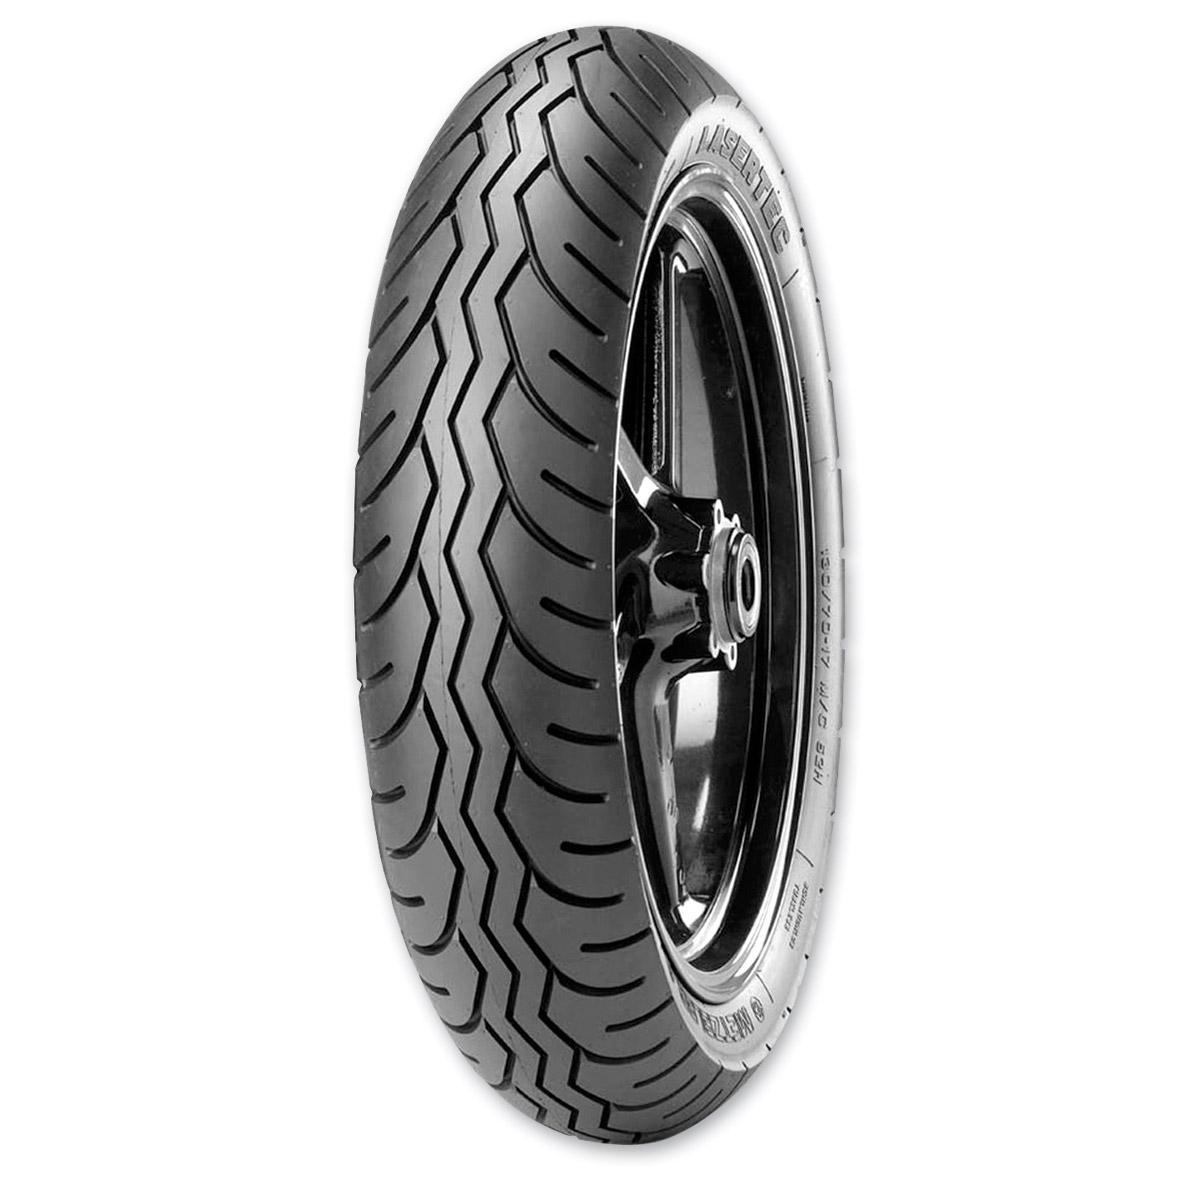 Metzeler Lasertec 4.00-18 Rear Tire